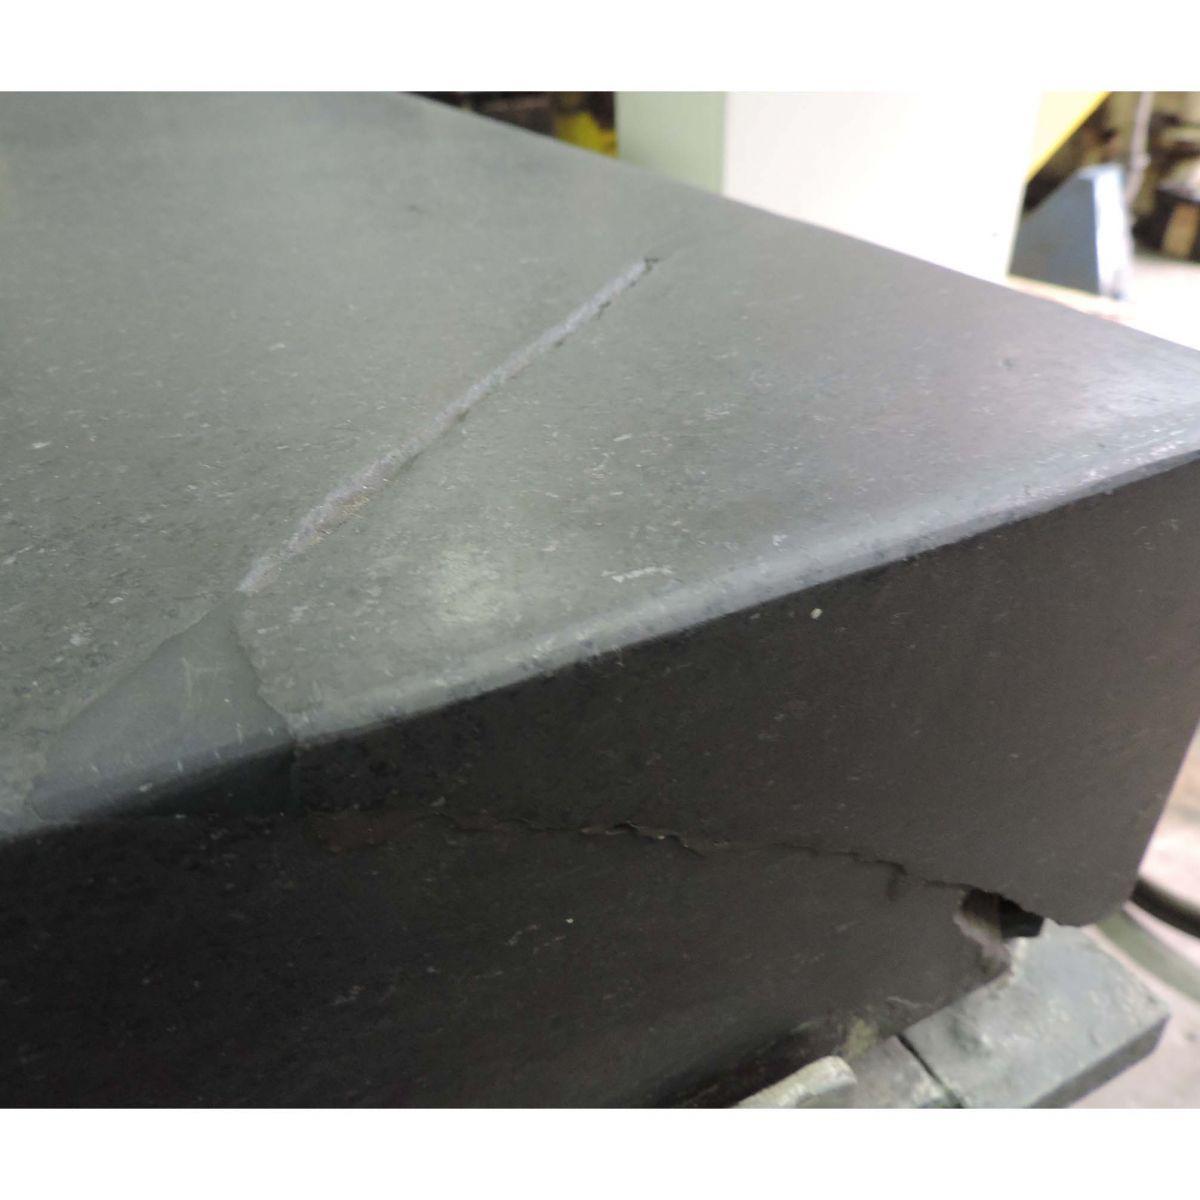 Mesa De Desempeno De Granito 1200x800mm Usada